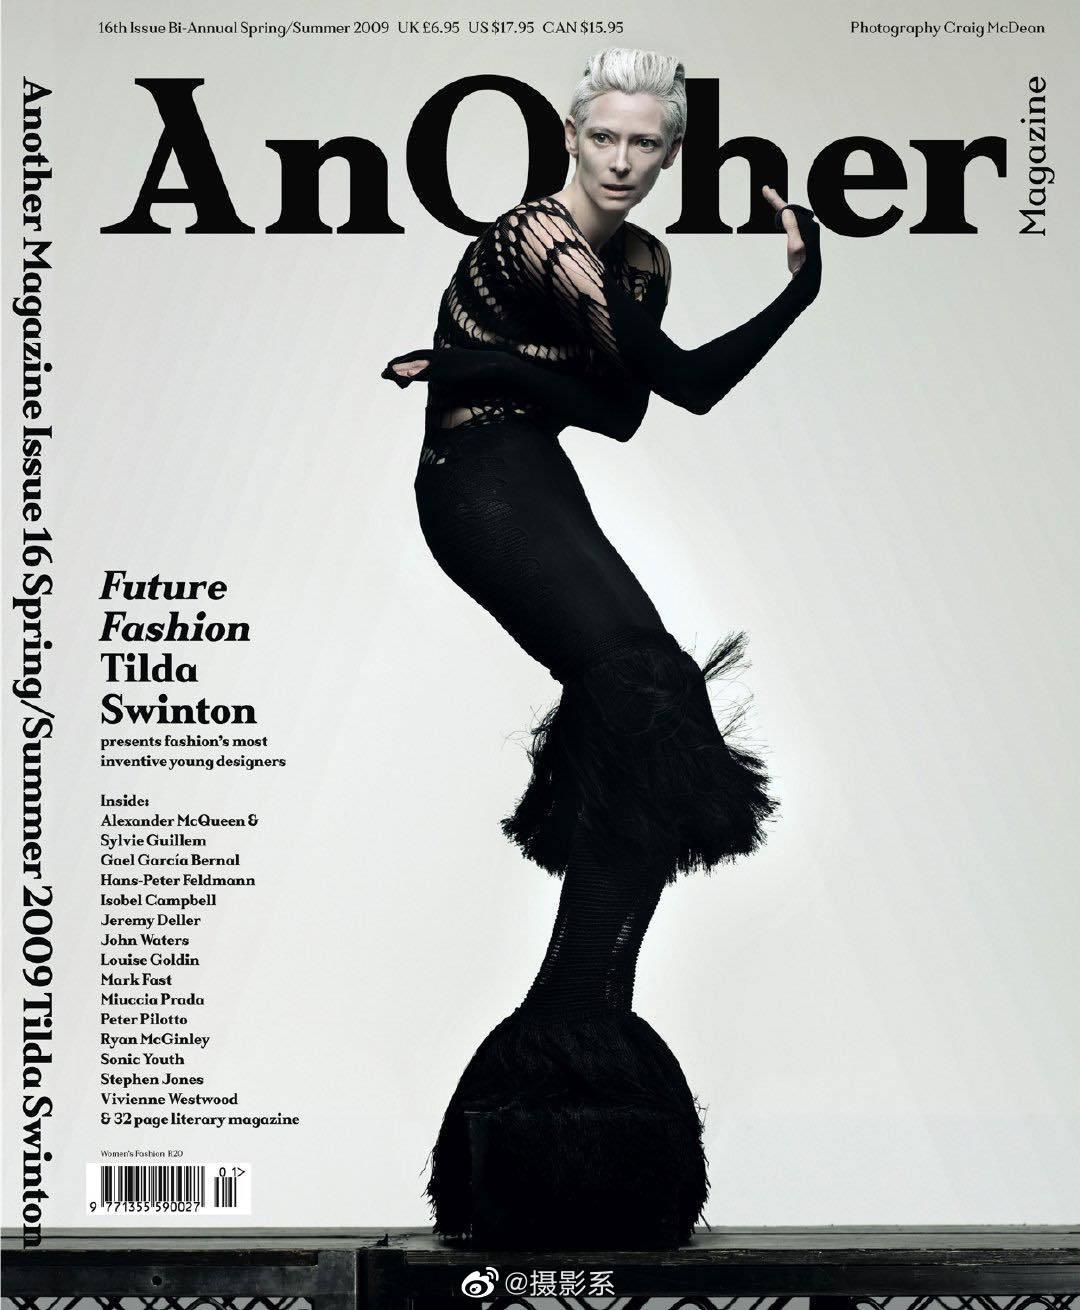 Tilda Swinton 在2009 AnOther Magazine 春夏号中的这组照片美翻天